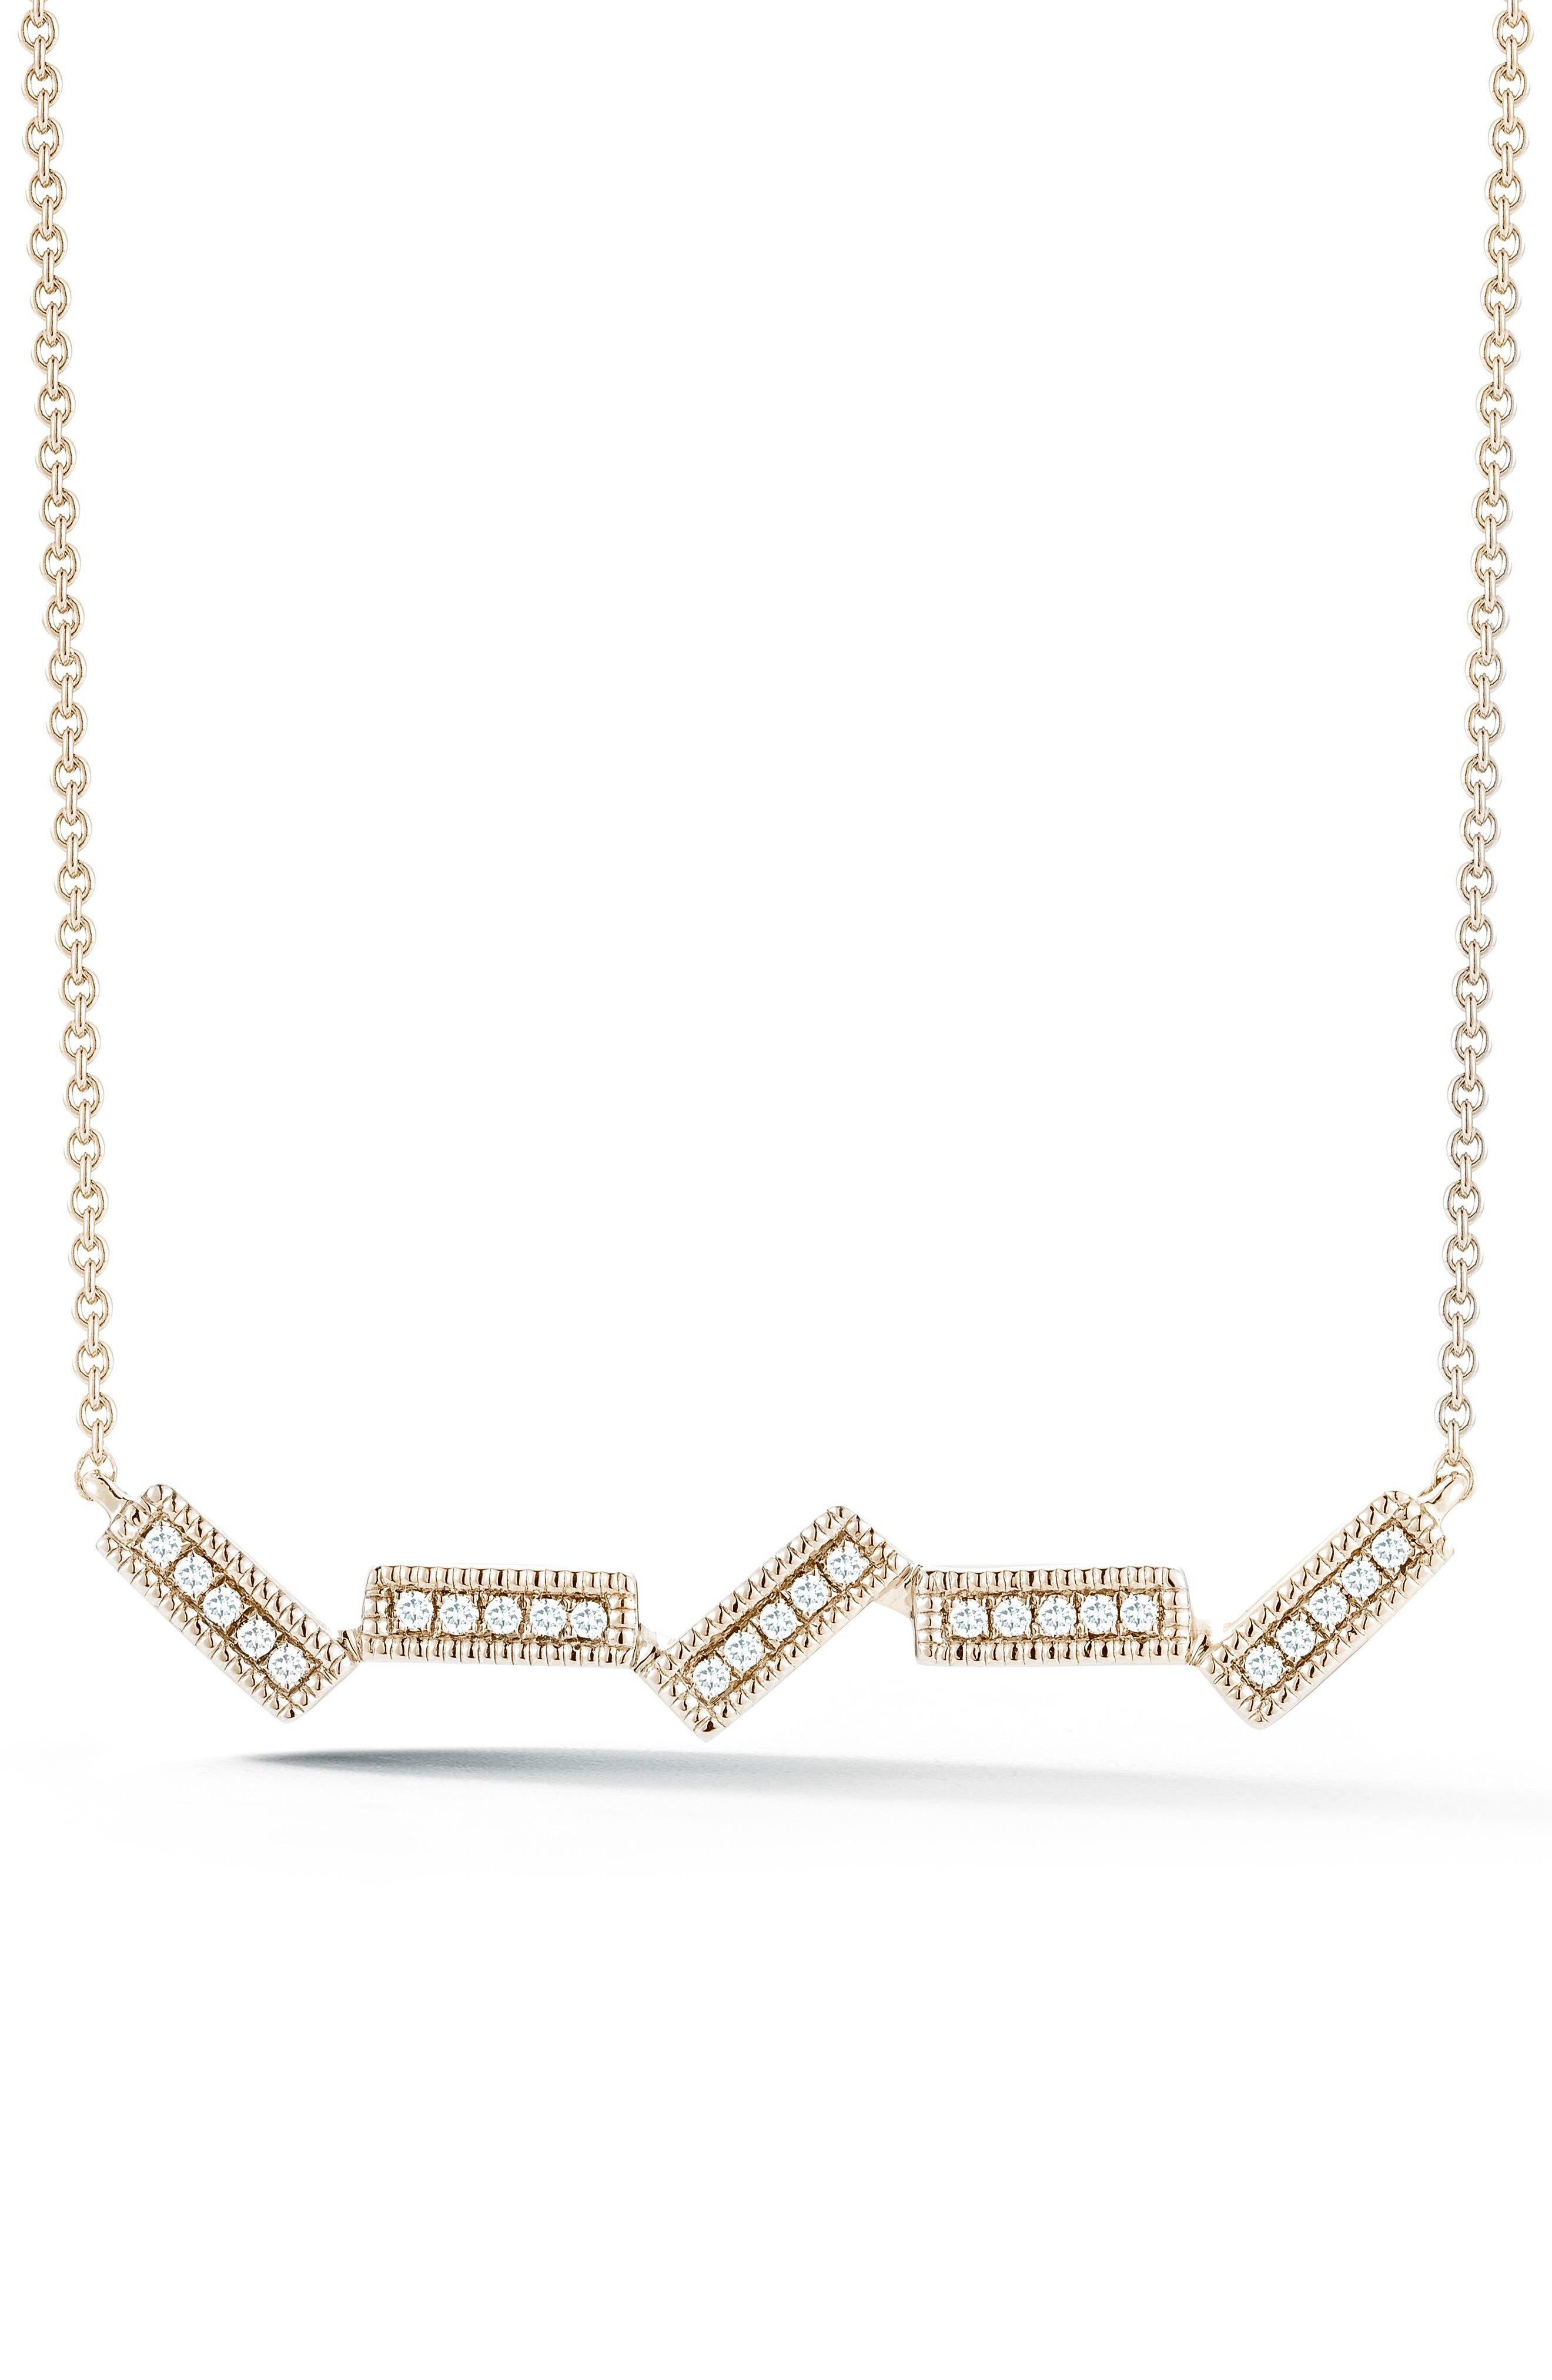 Main Image - Dana Rebecca Designs Sylvie Rose Five-Bar Diamond Pendant Necklace